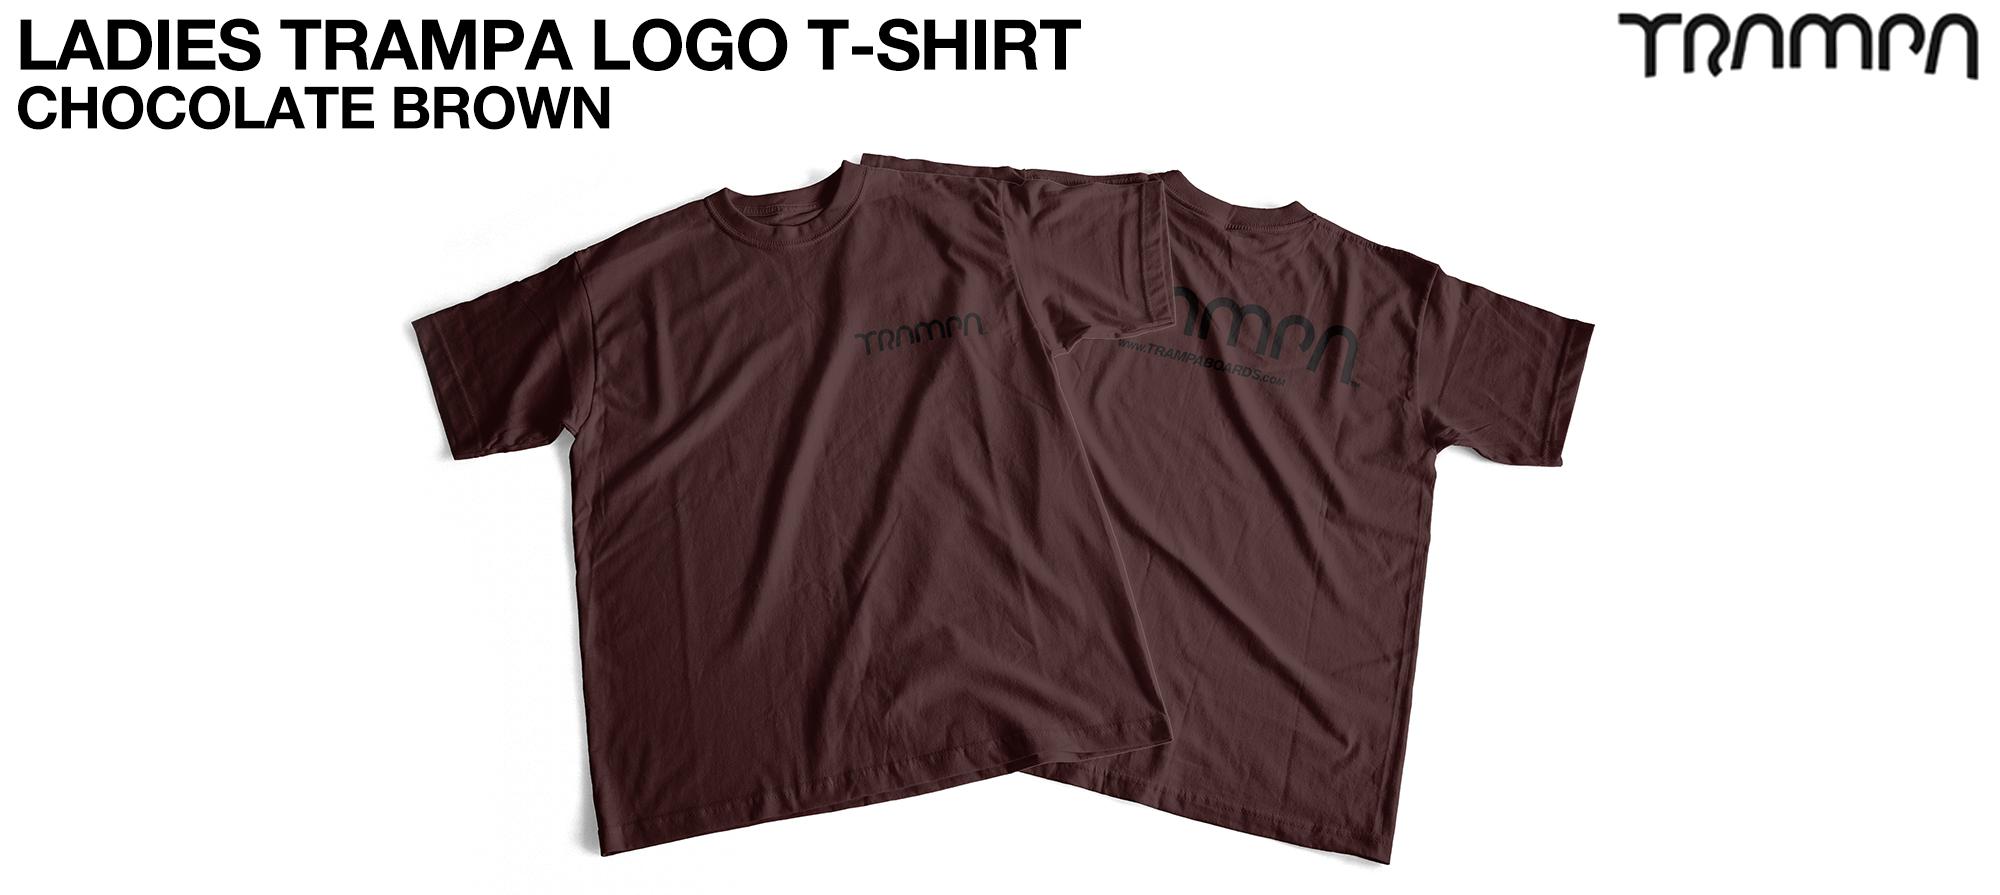 Chocolate Brown T-shirt